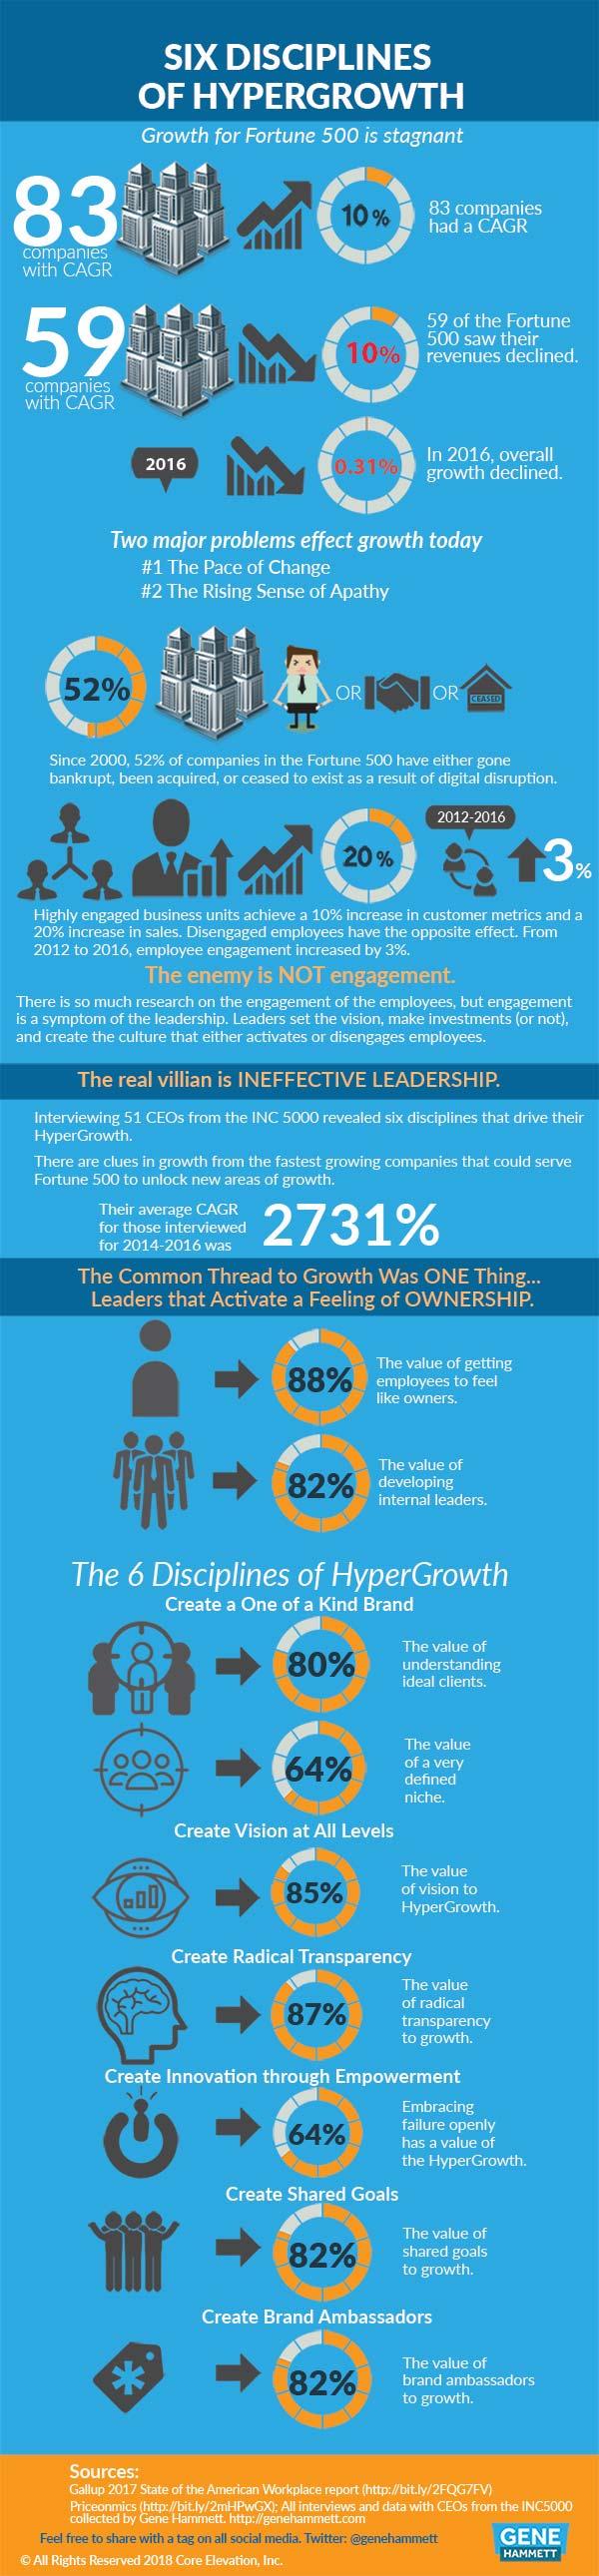 Six_disciplines_of_hypergrowth-comp